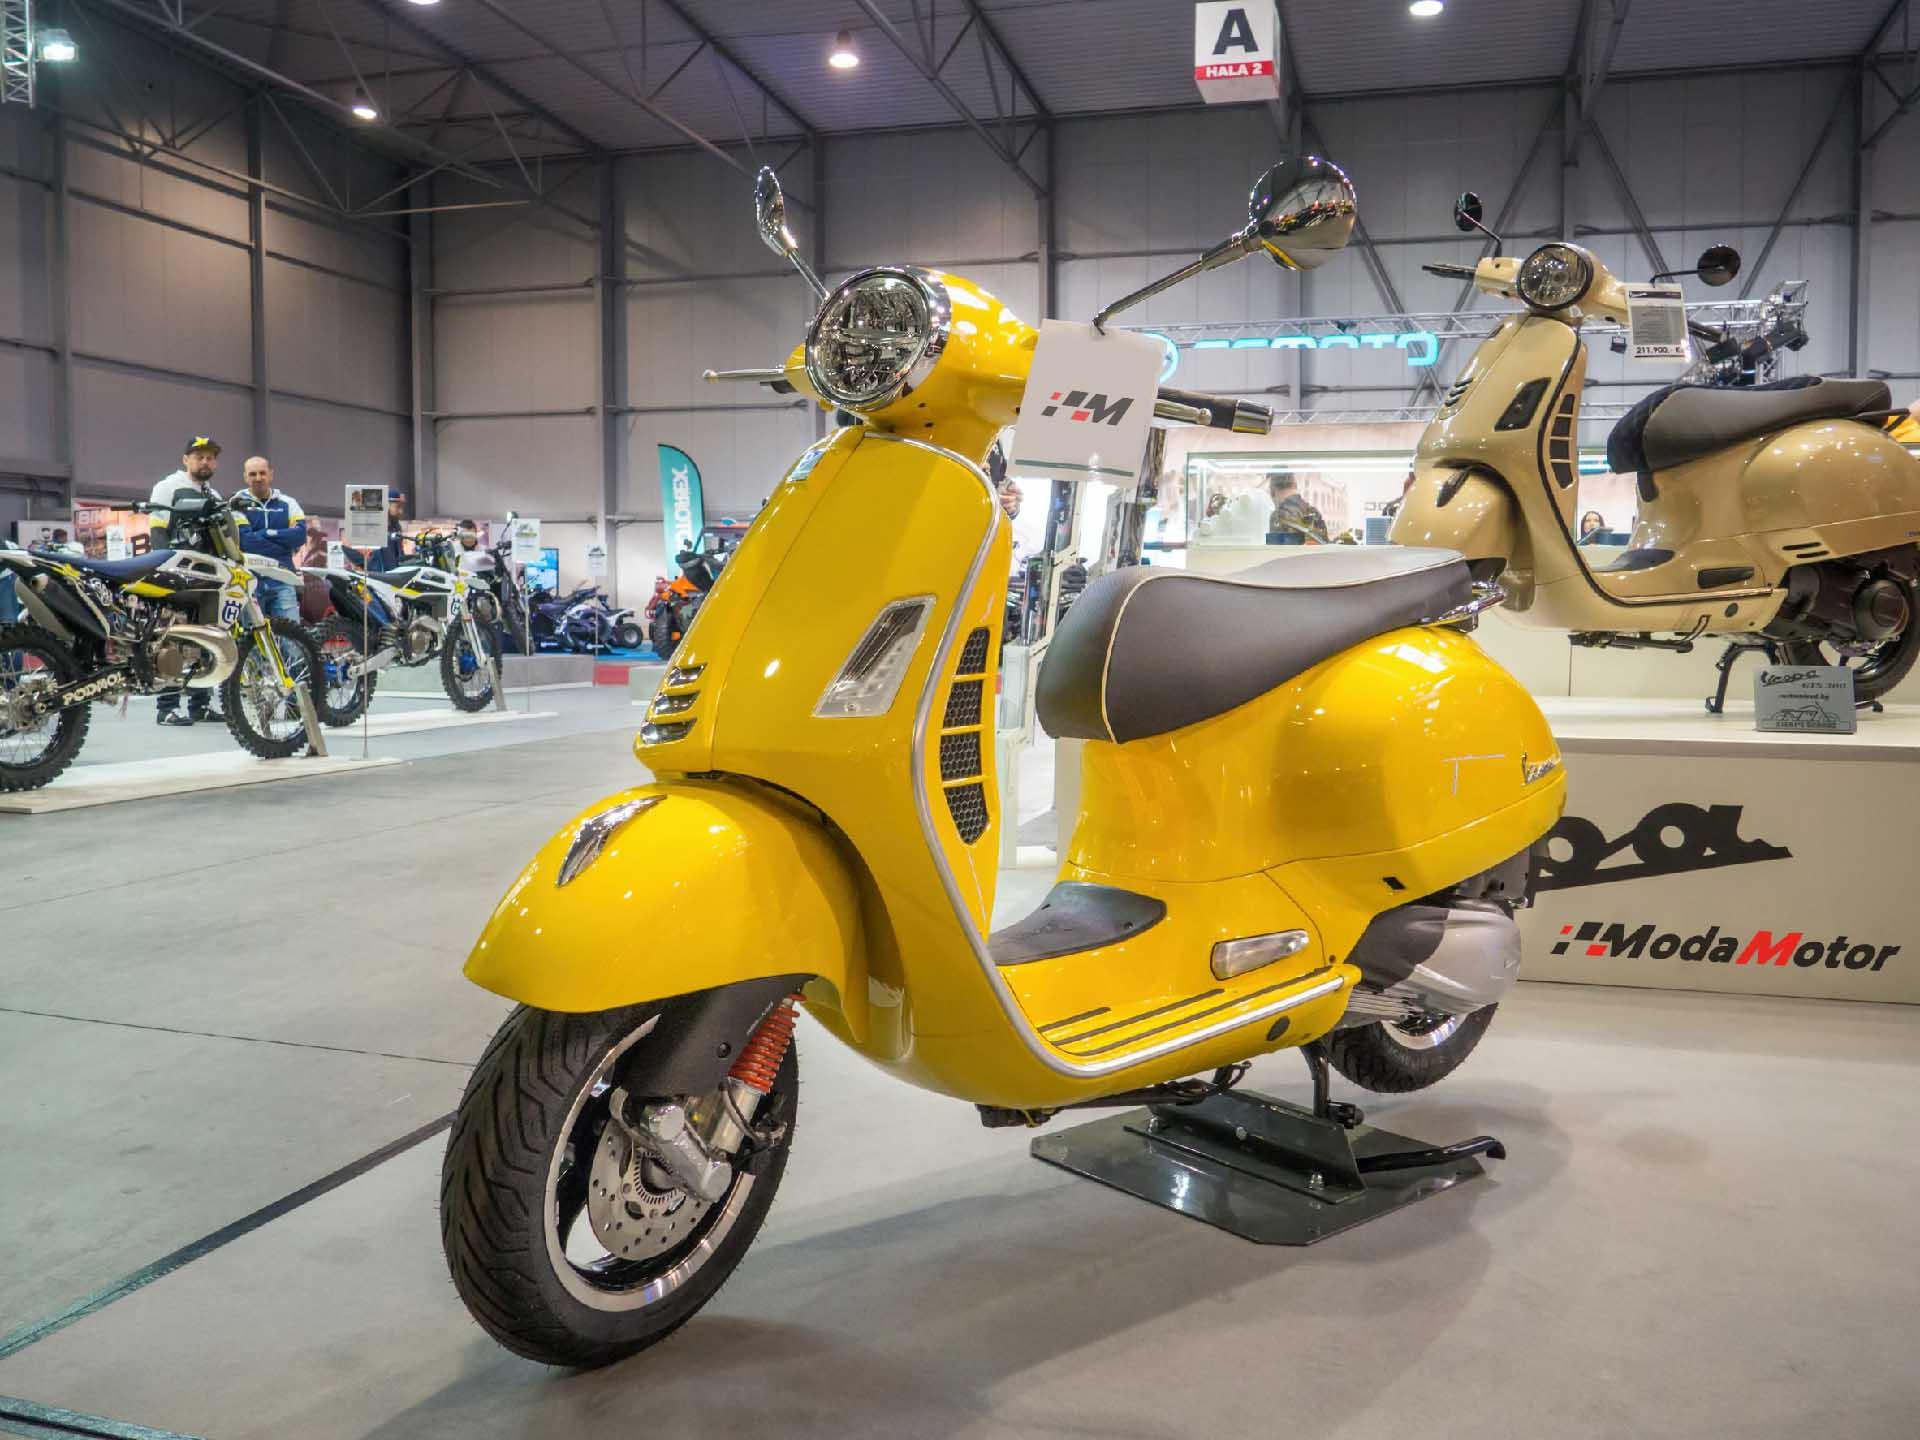 moda motor scooter